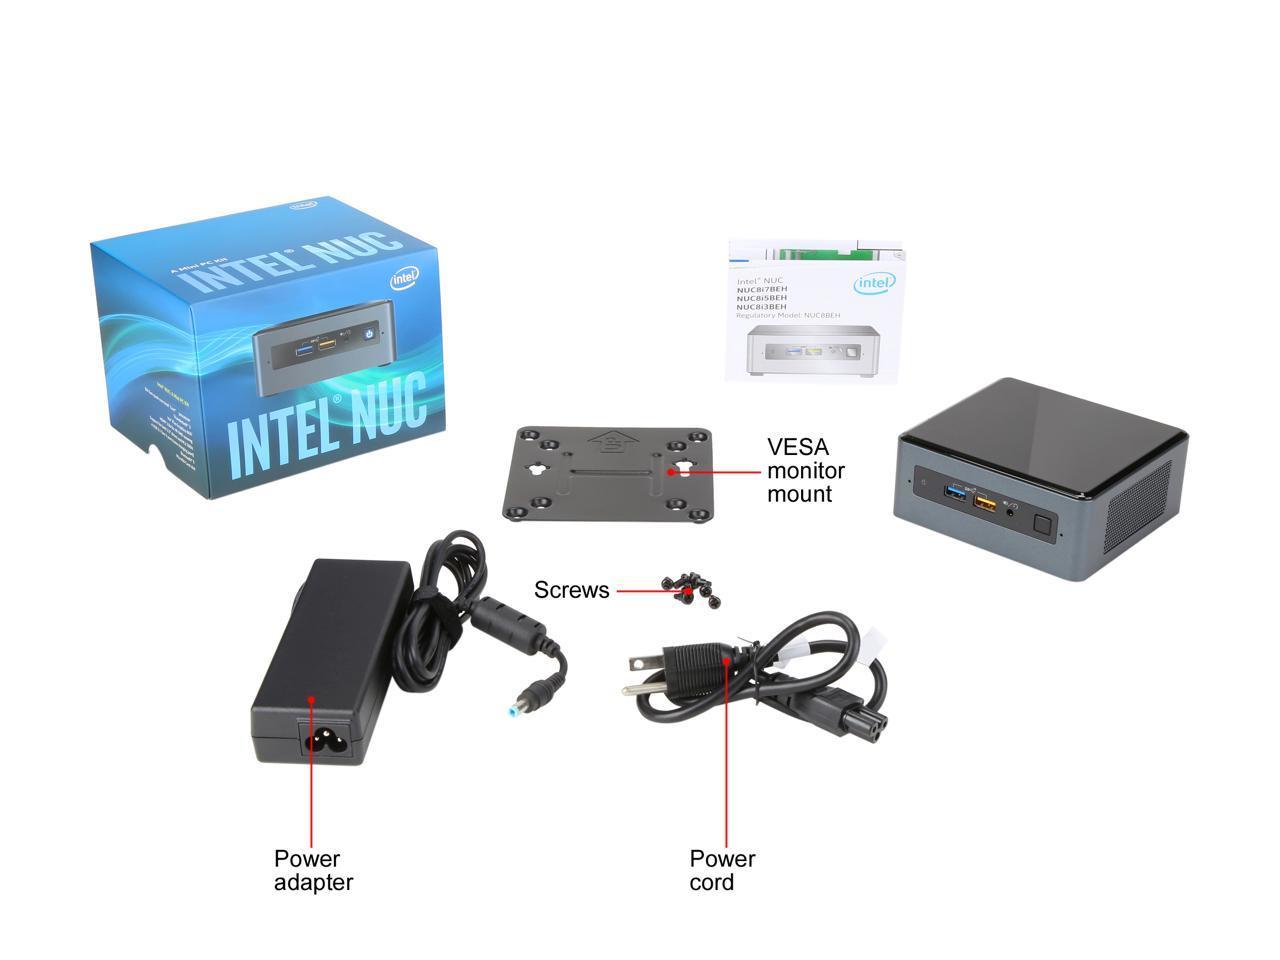 Details about Intel NUC (Next Unit of Computing) BOXNUC8i5BEH1 Black Mini /  Booksize Barebone